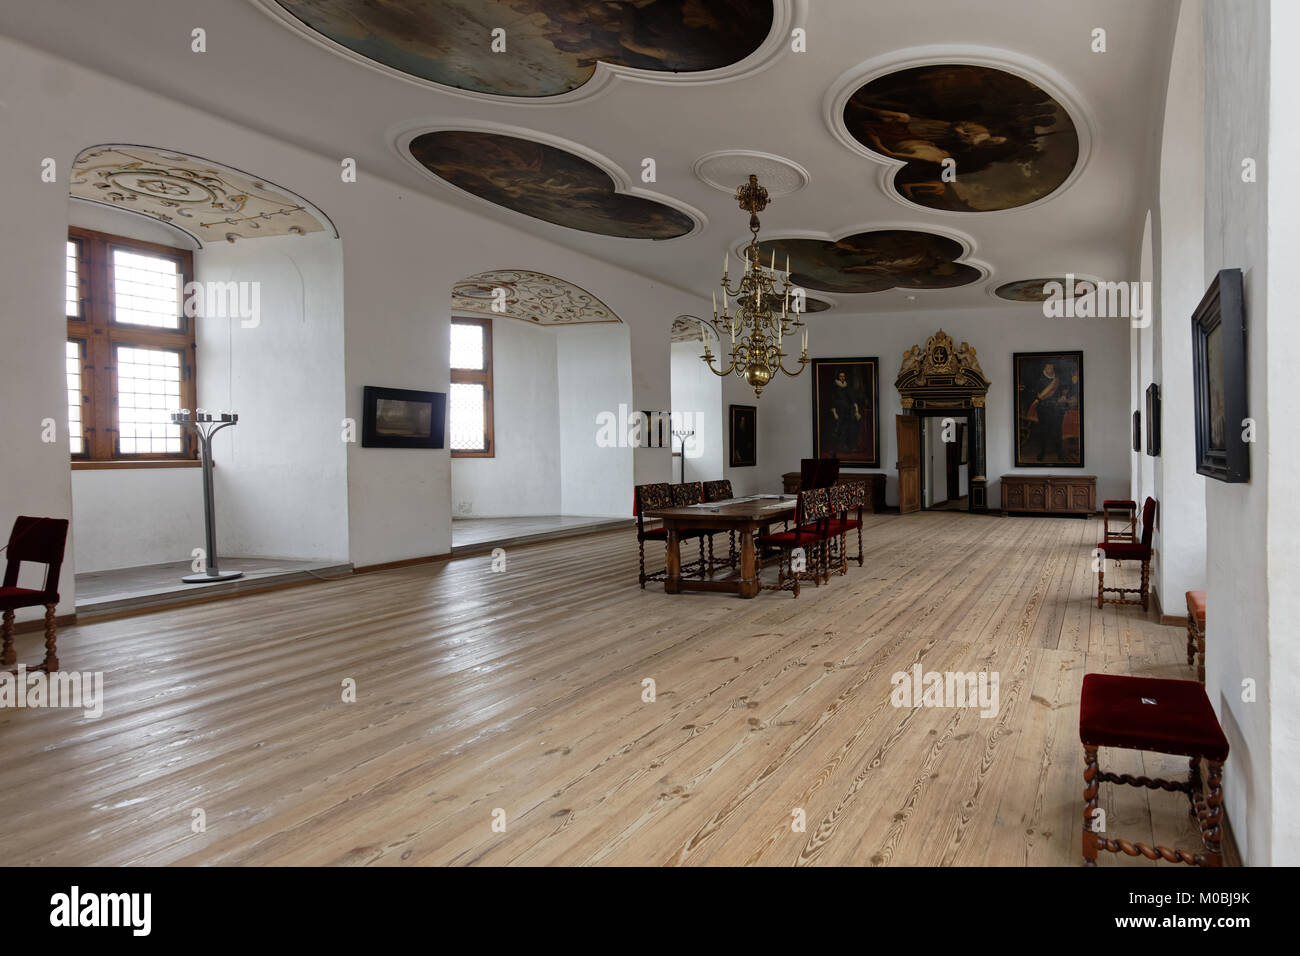 Helsingor, Denmark - November 6, 2016: Interior of Kronborg Castle. Kronborg is one of the most important Renaissance - Stock Image